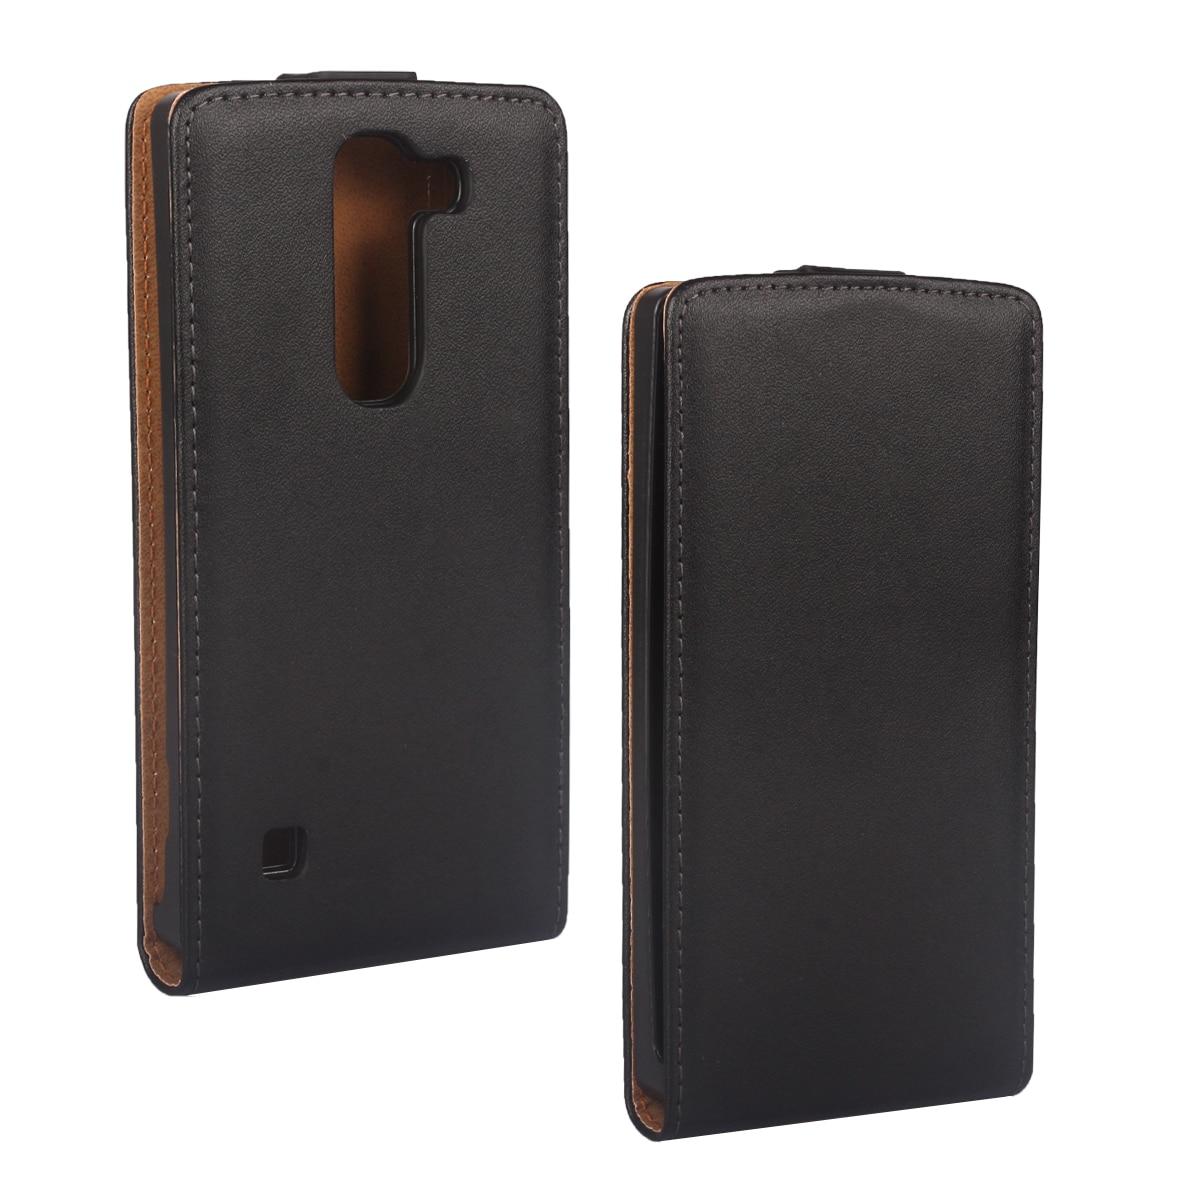 Flip-Case Bag-Accessory Lg Spirit Lg Magna Lg Leon Coque Back-Cover For 4G LTE G4C Vertical